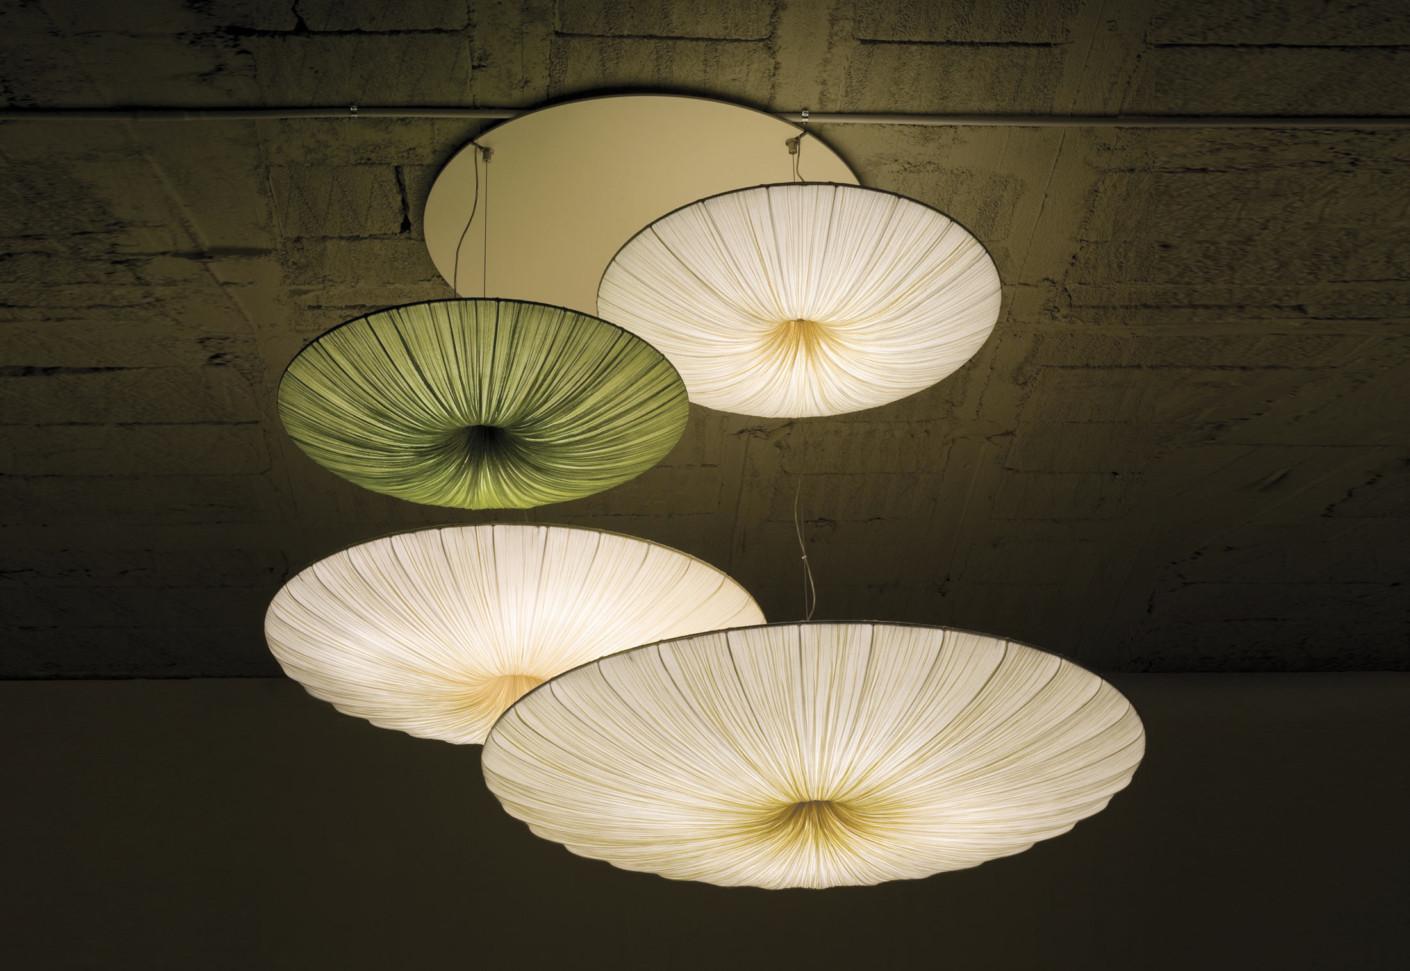 aqua creations lighting. aqua creations lighting